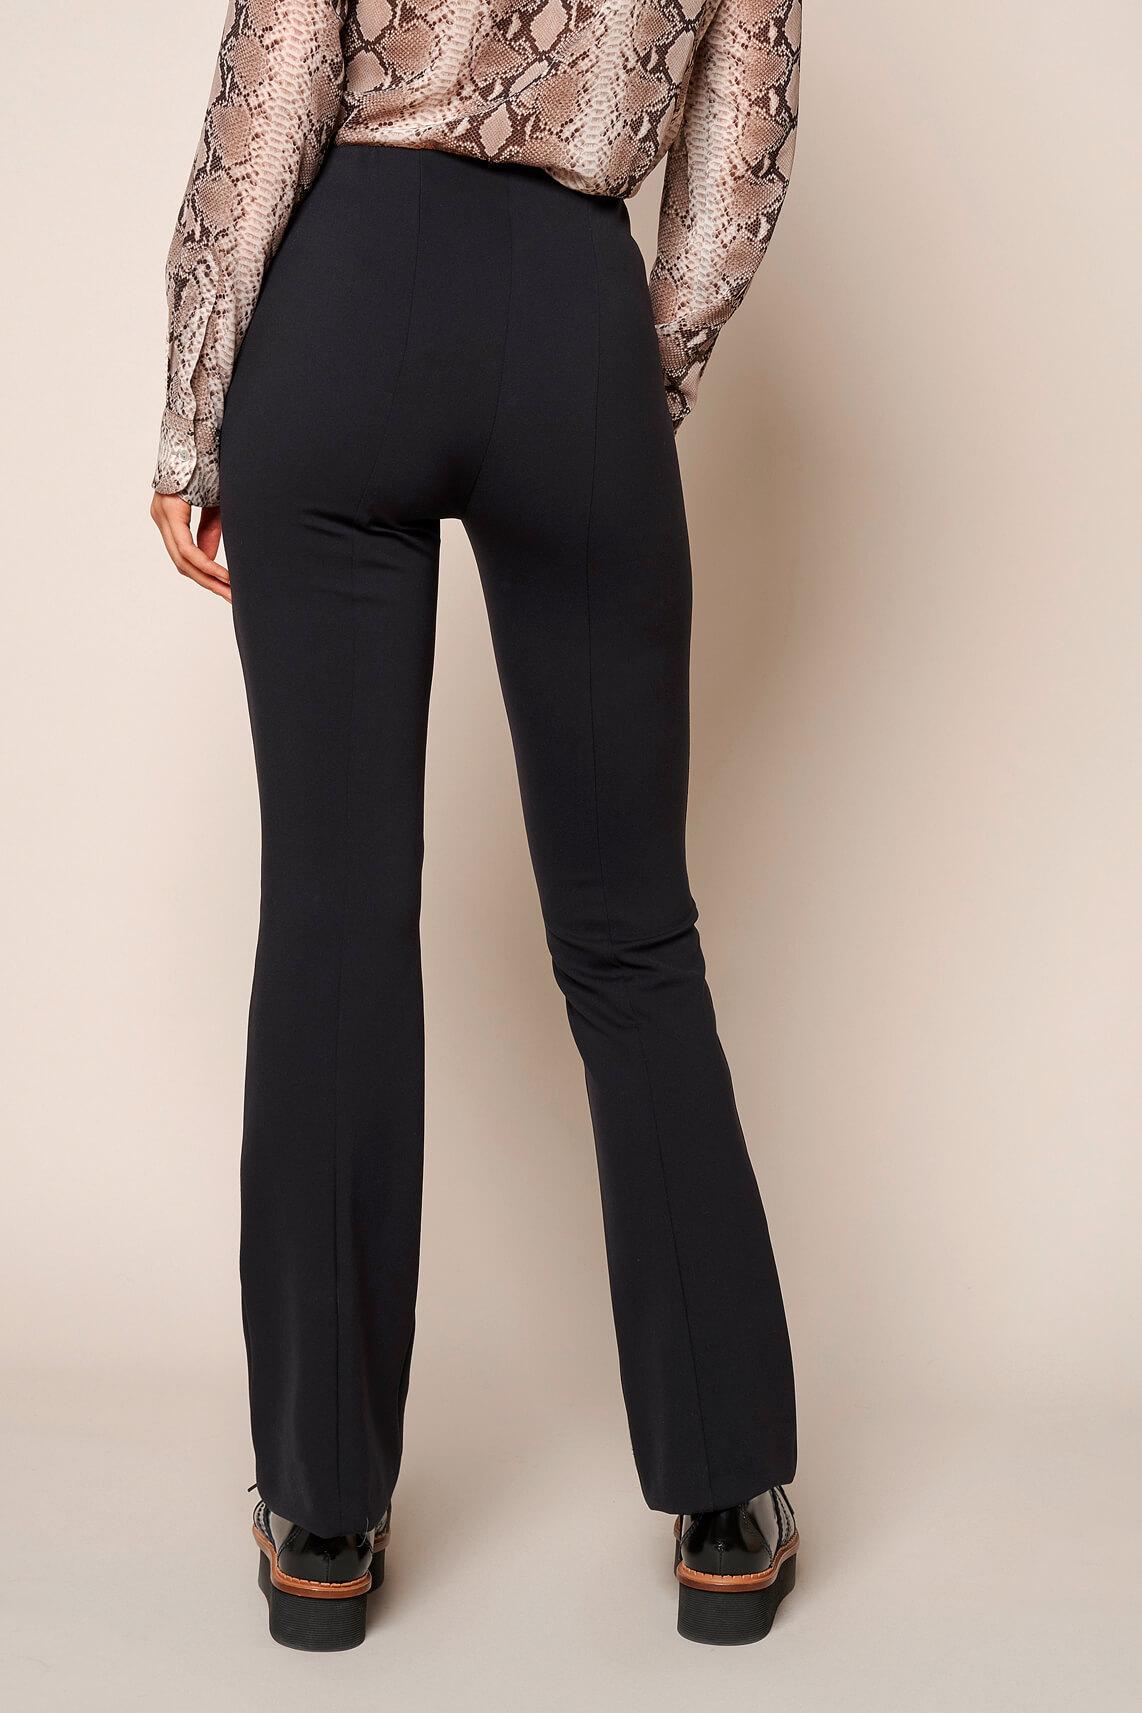 Rosner Dames L32 Antonia pantalon zwart